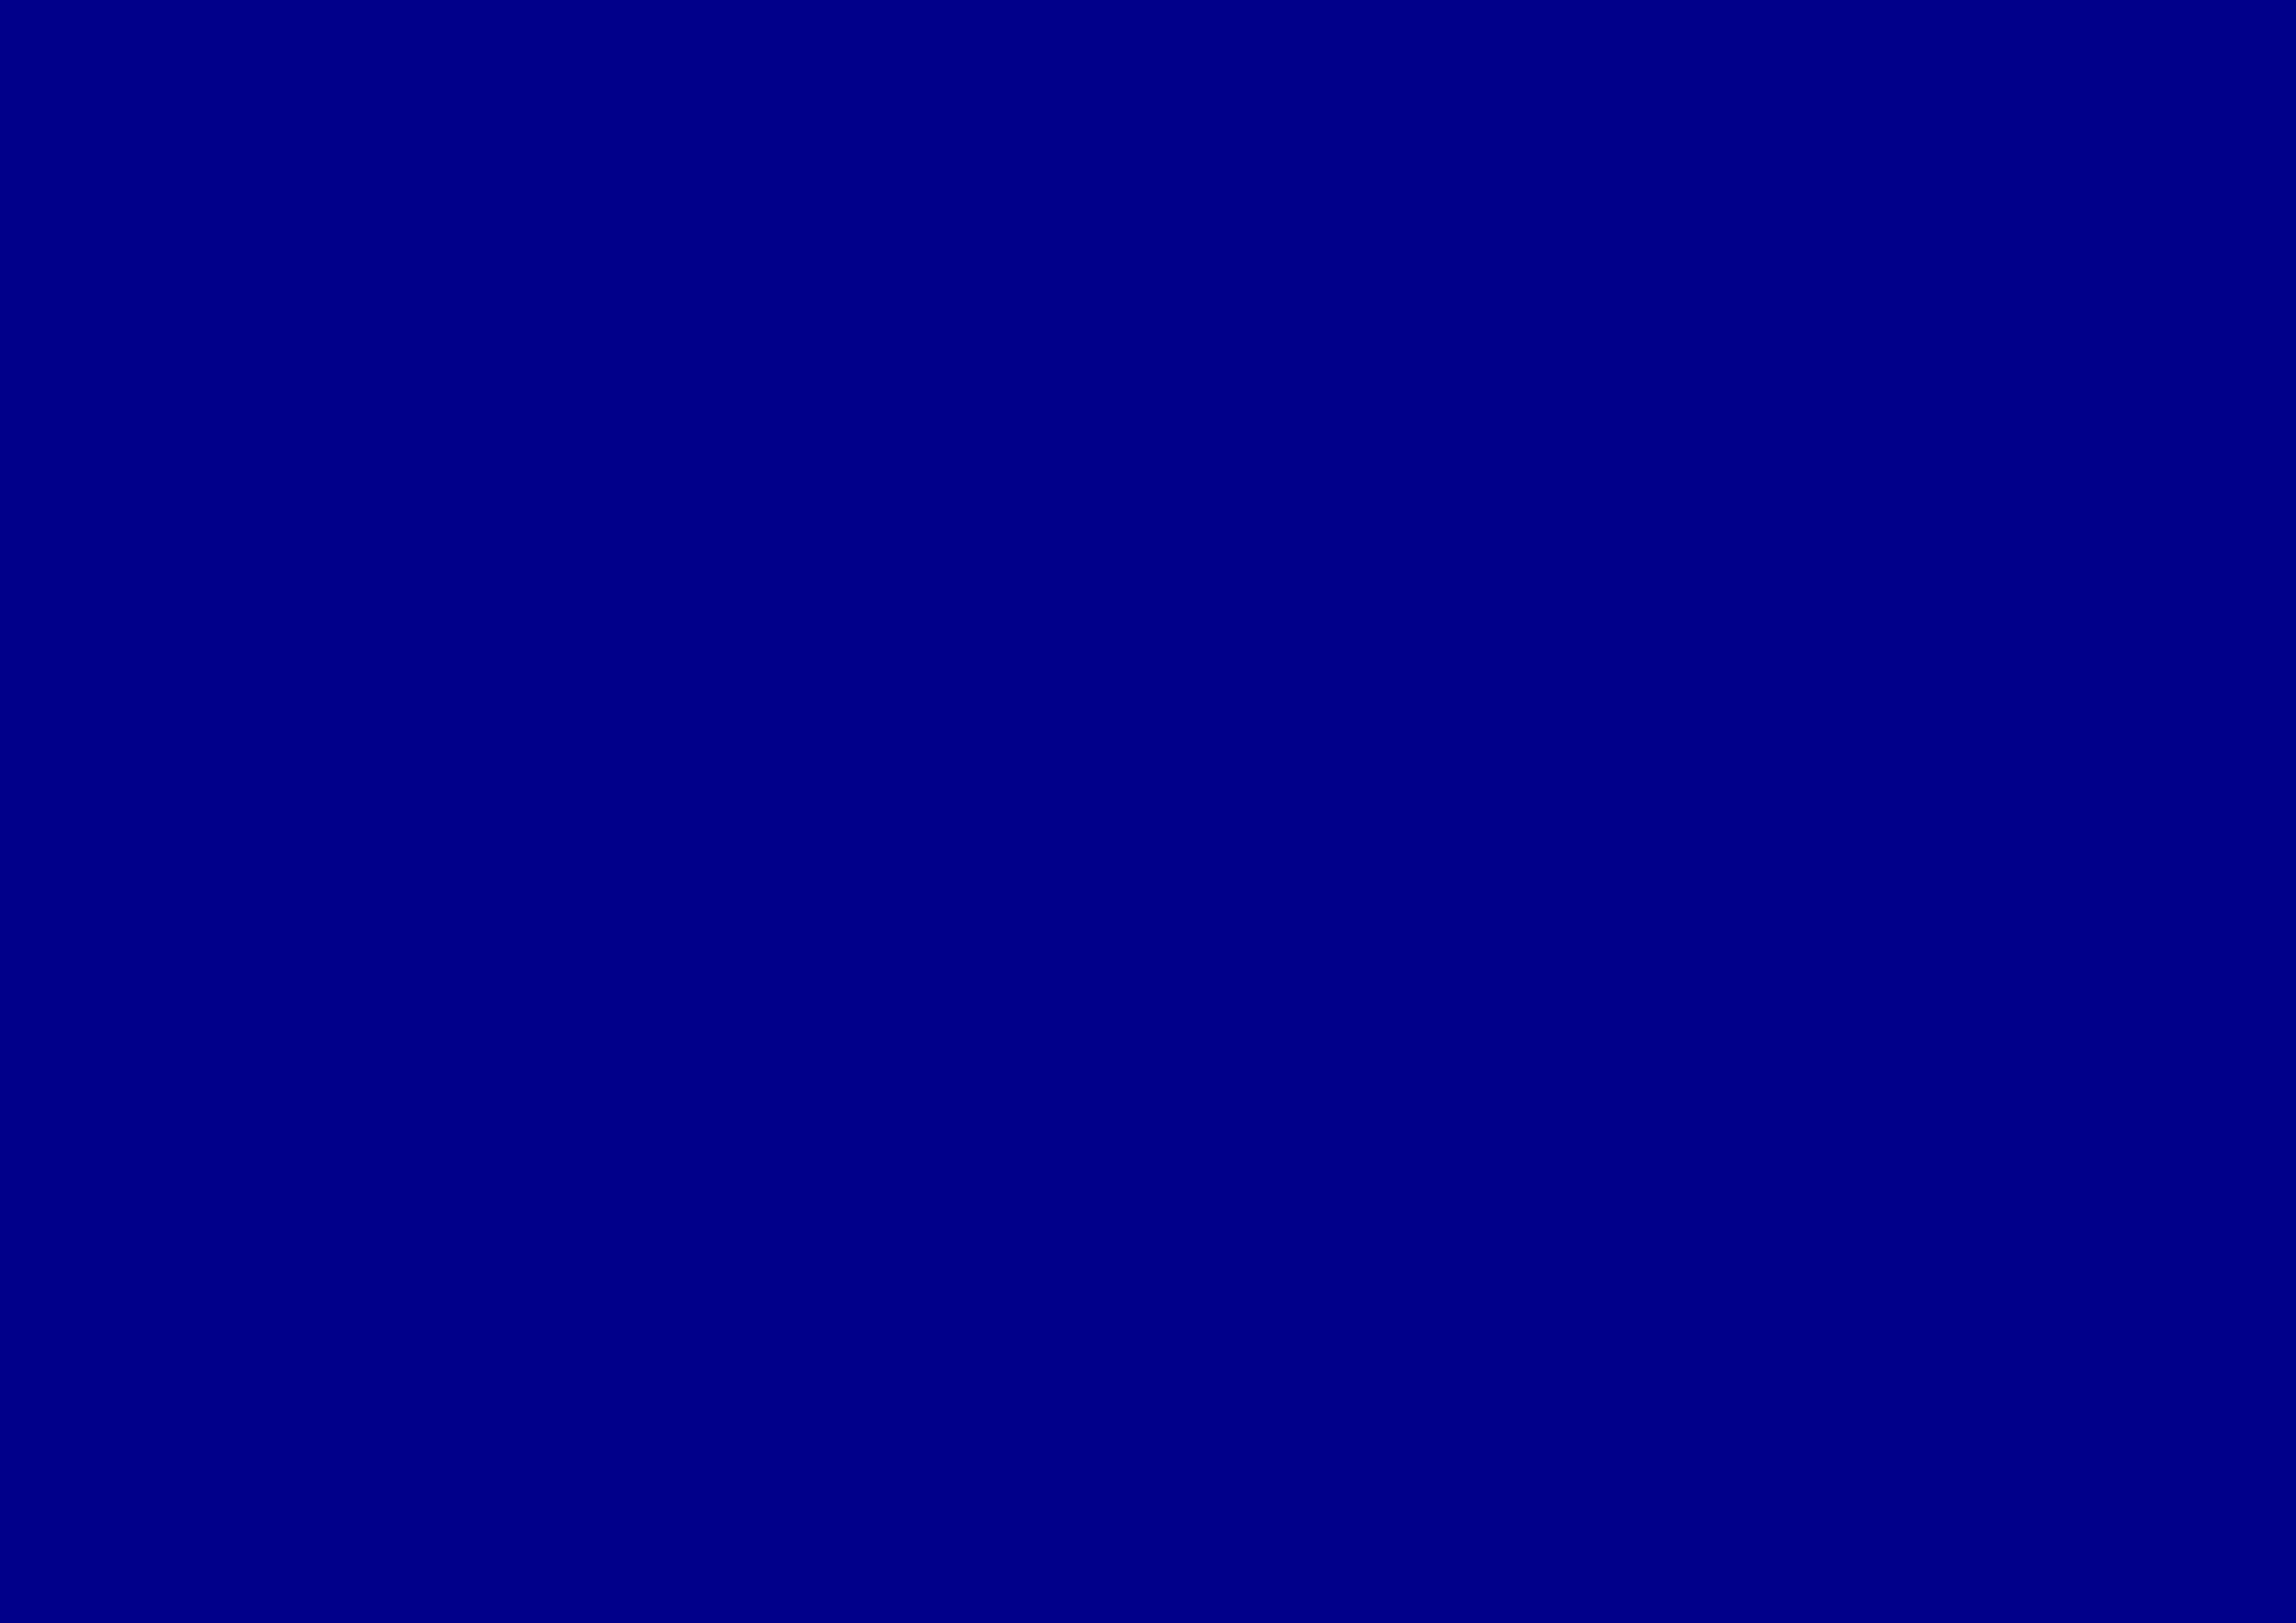 3508x2480 Dark Blue Solid Color Background